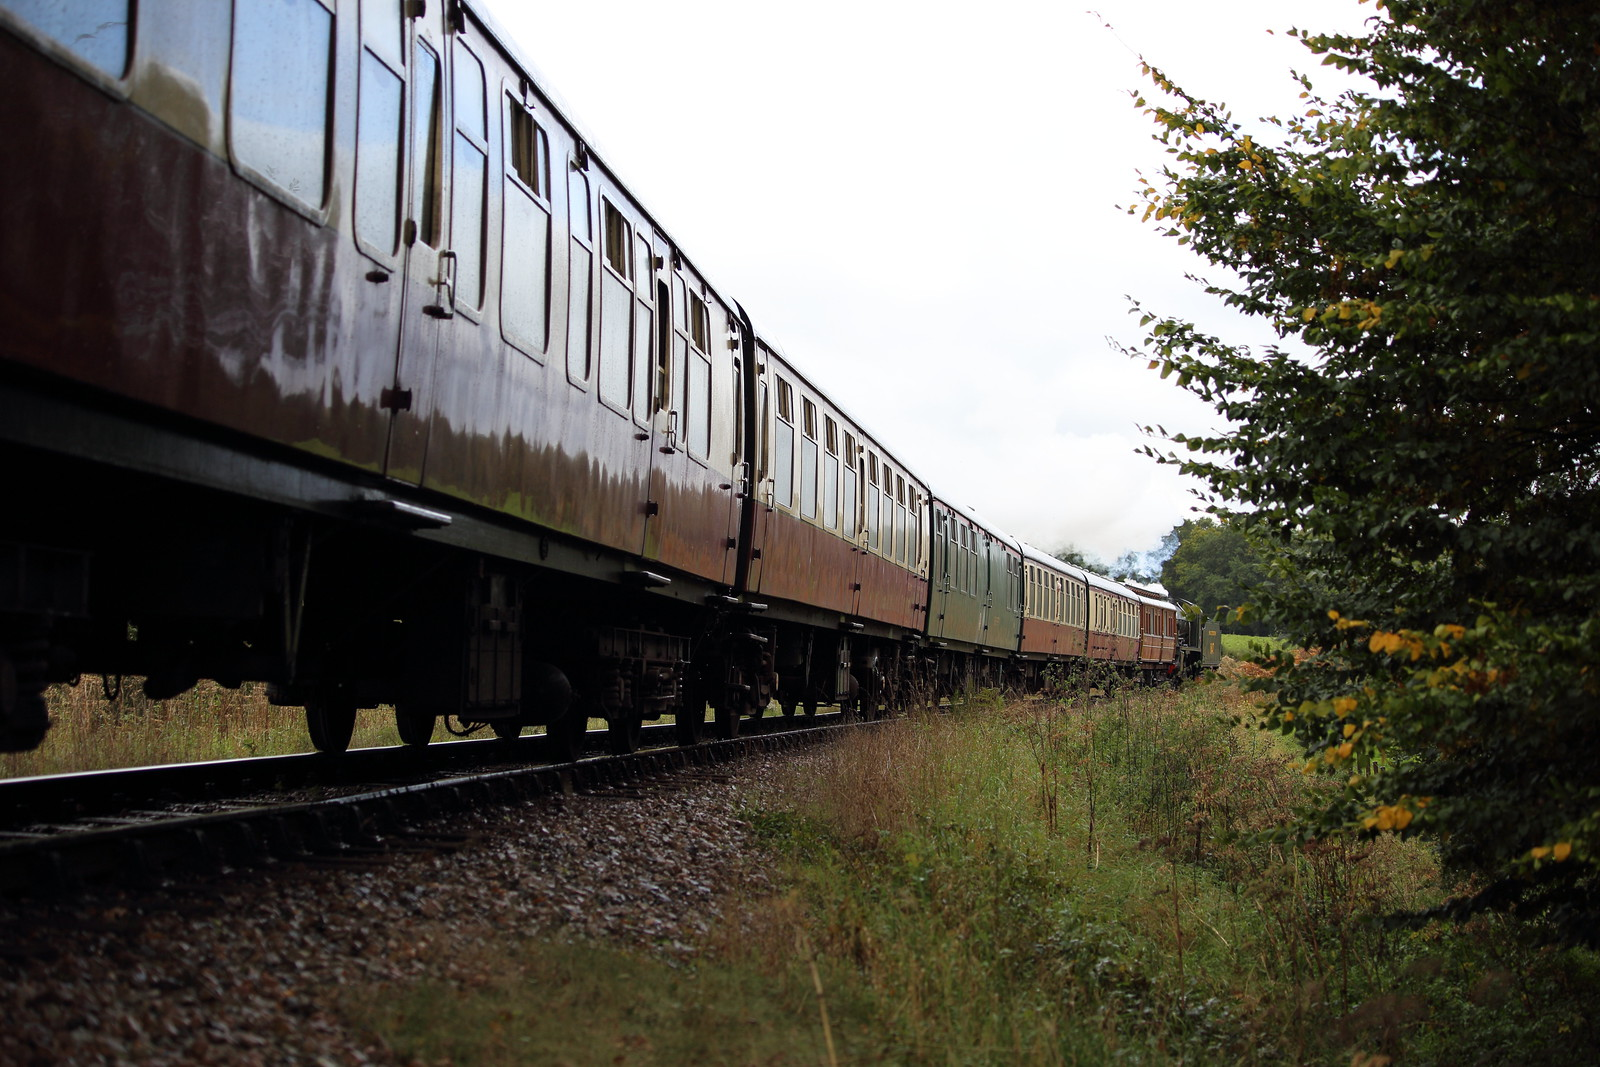 S15 Class on Bluebell Railway